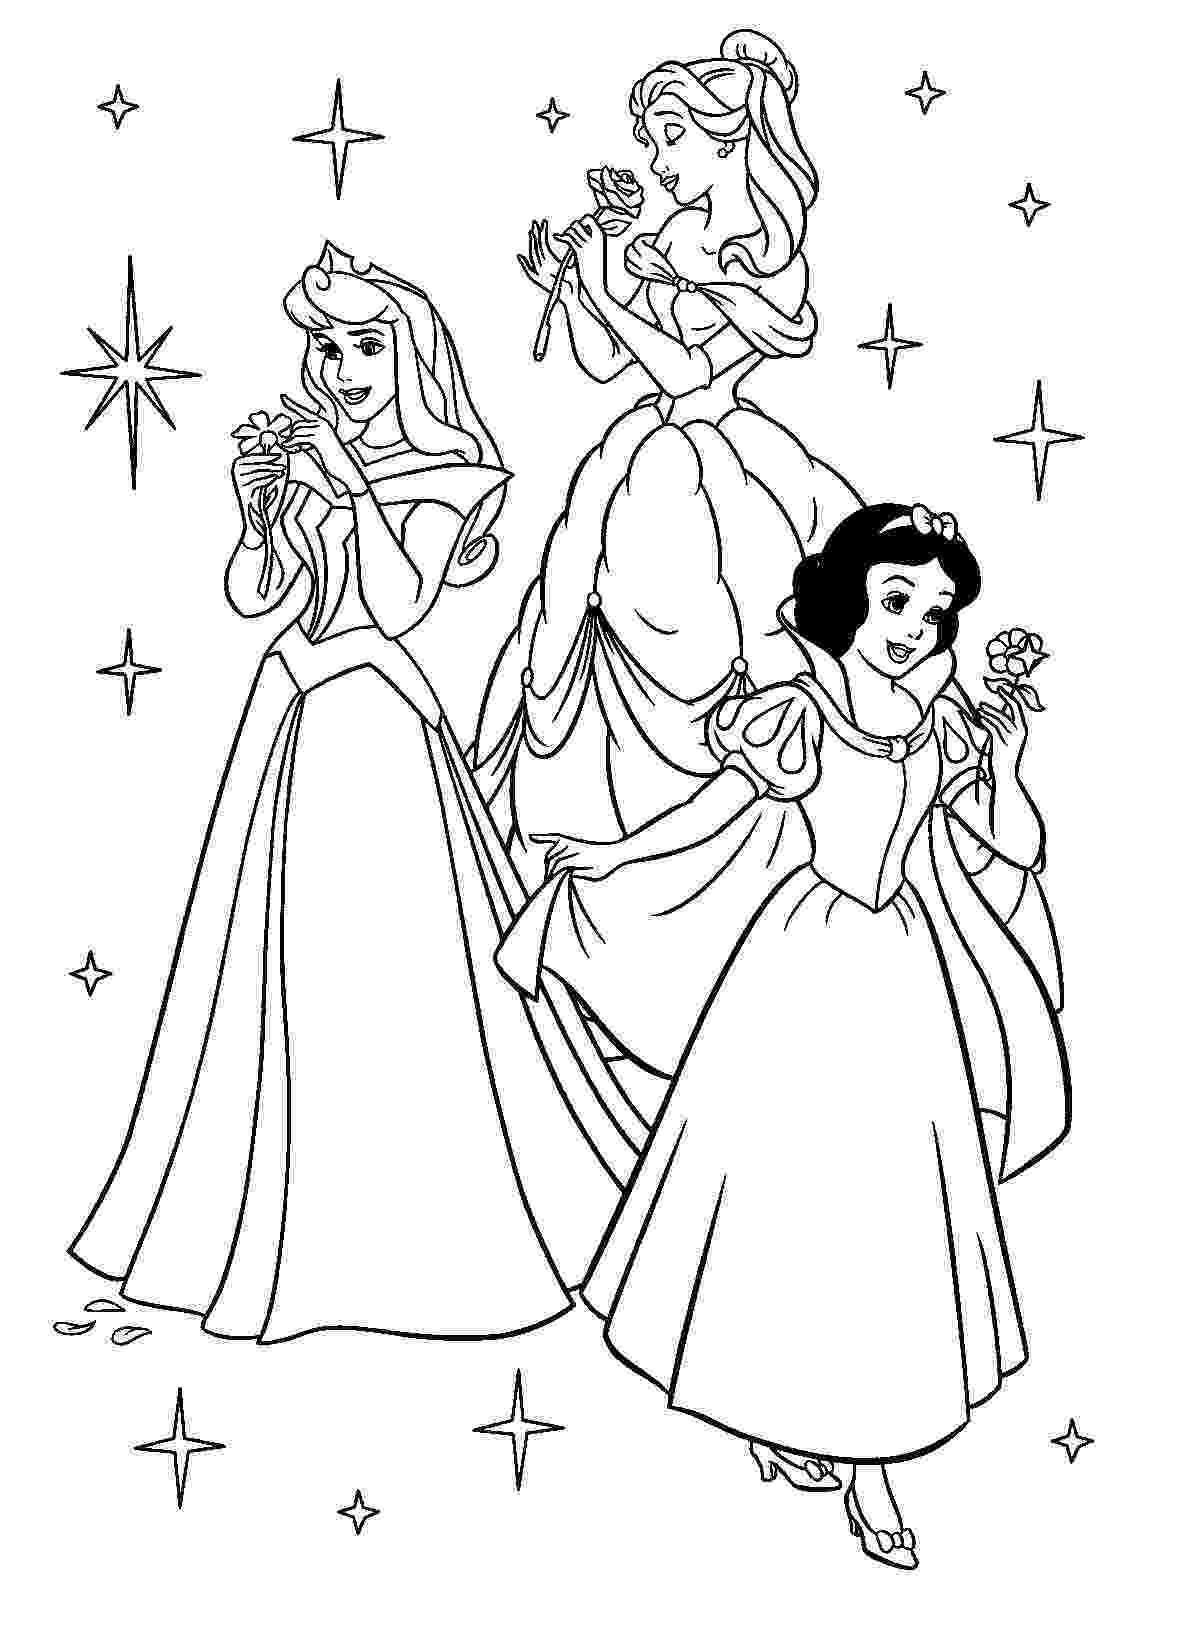 disnep princess coloring pages printable princess coloring pages best coloring pages for kids coloring disnep pages printable princess